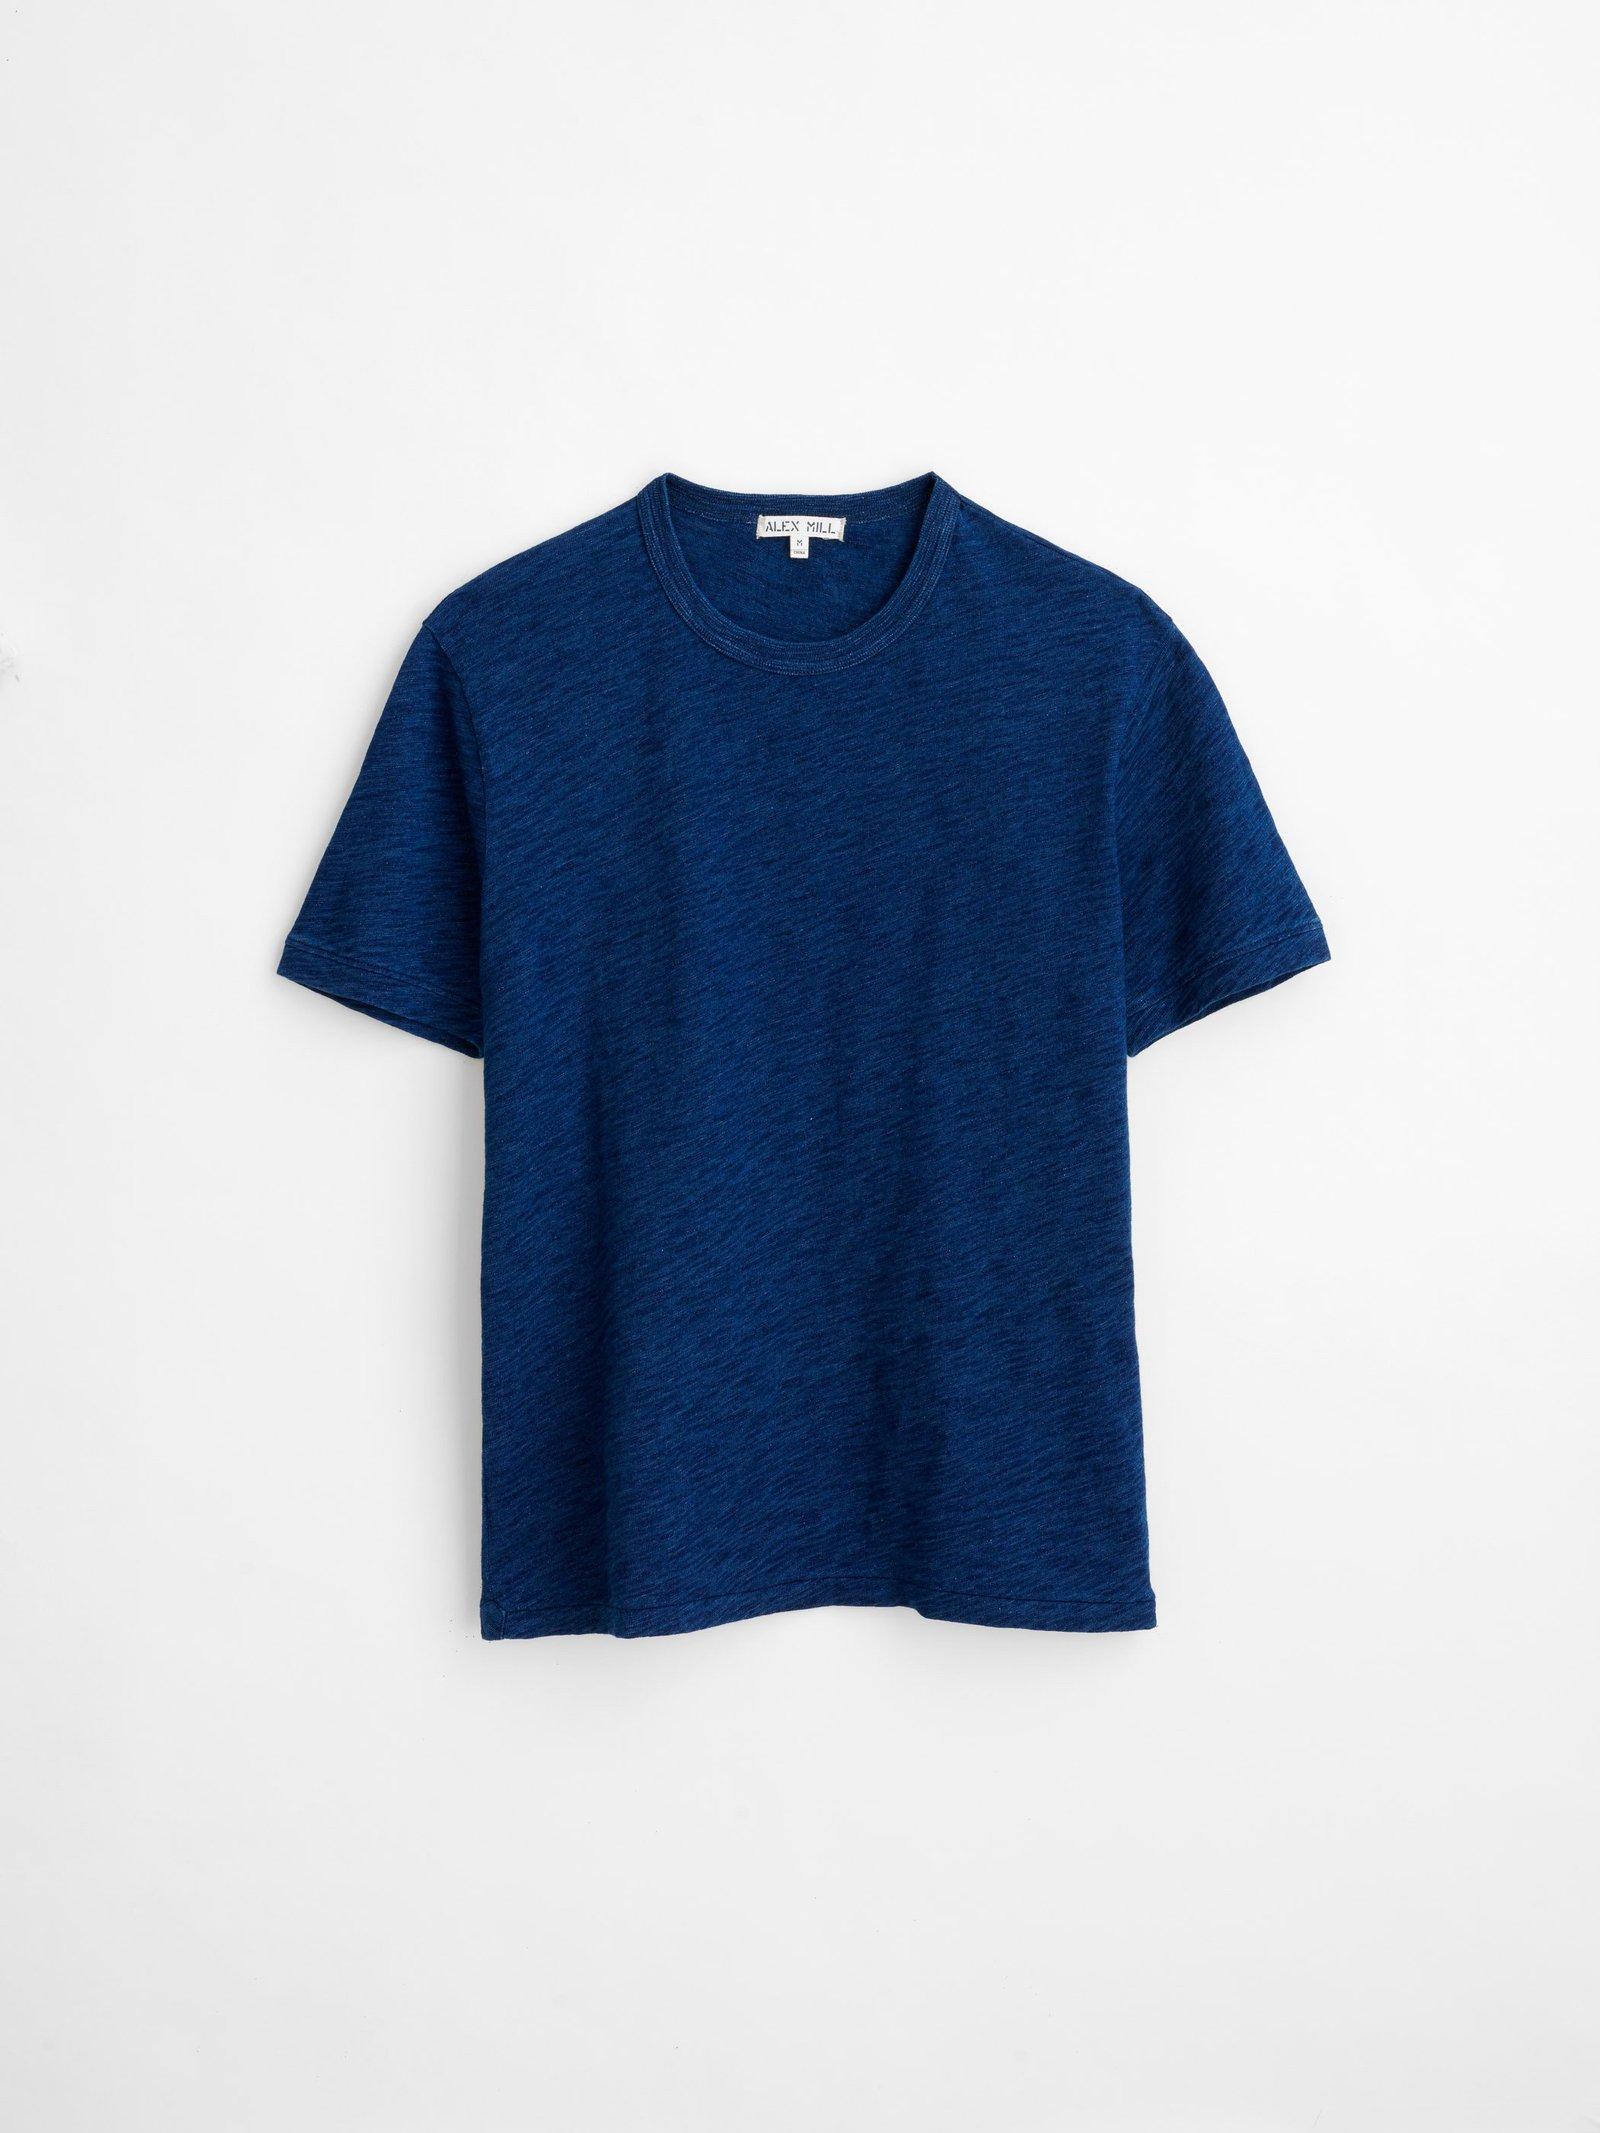 Alex Mill Standard T-Shirt in Indigo Slub Cotton